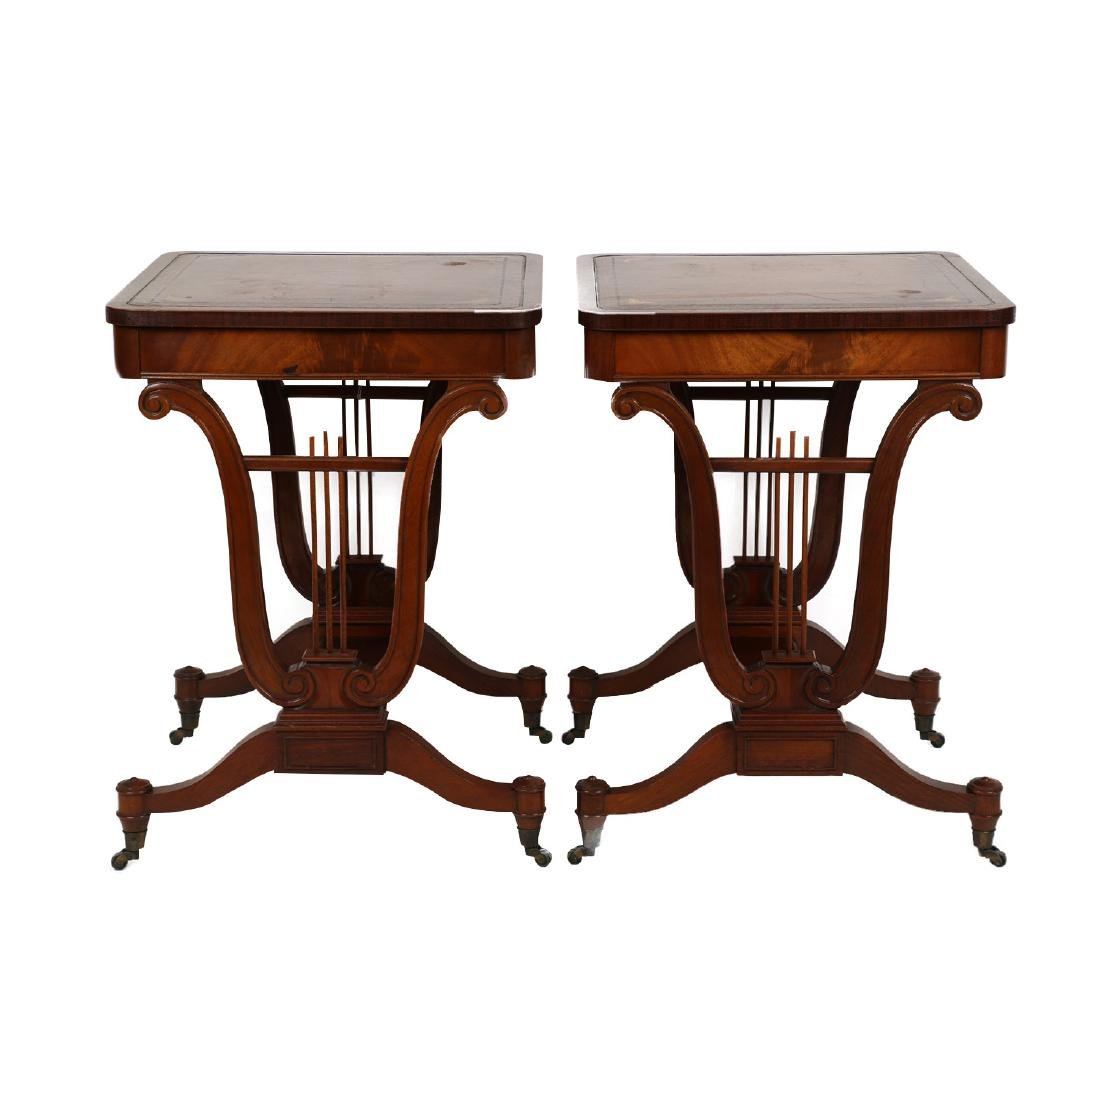 English Mahogany Side Tables